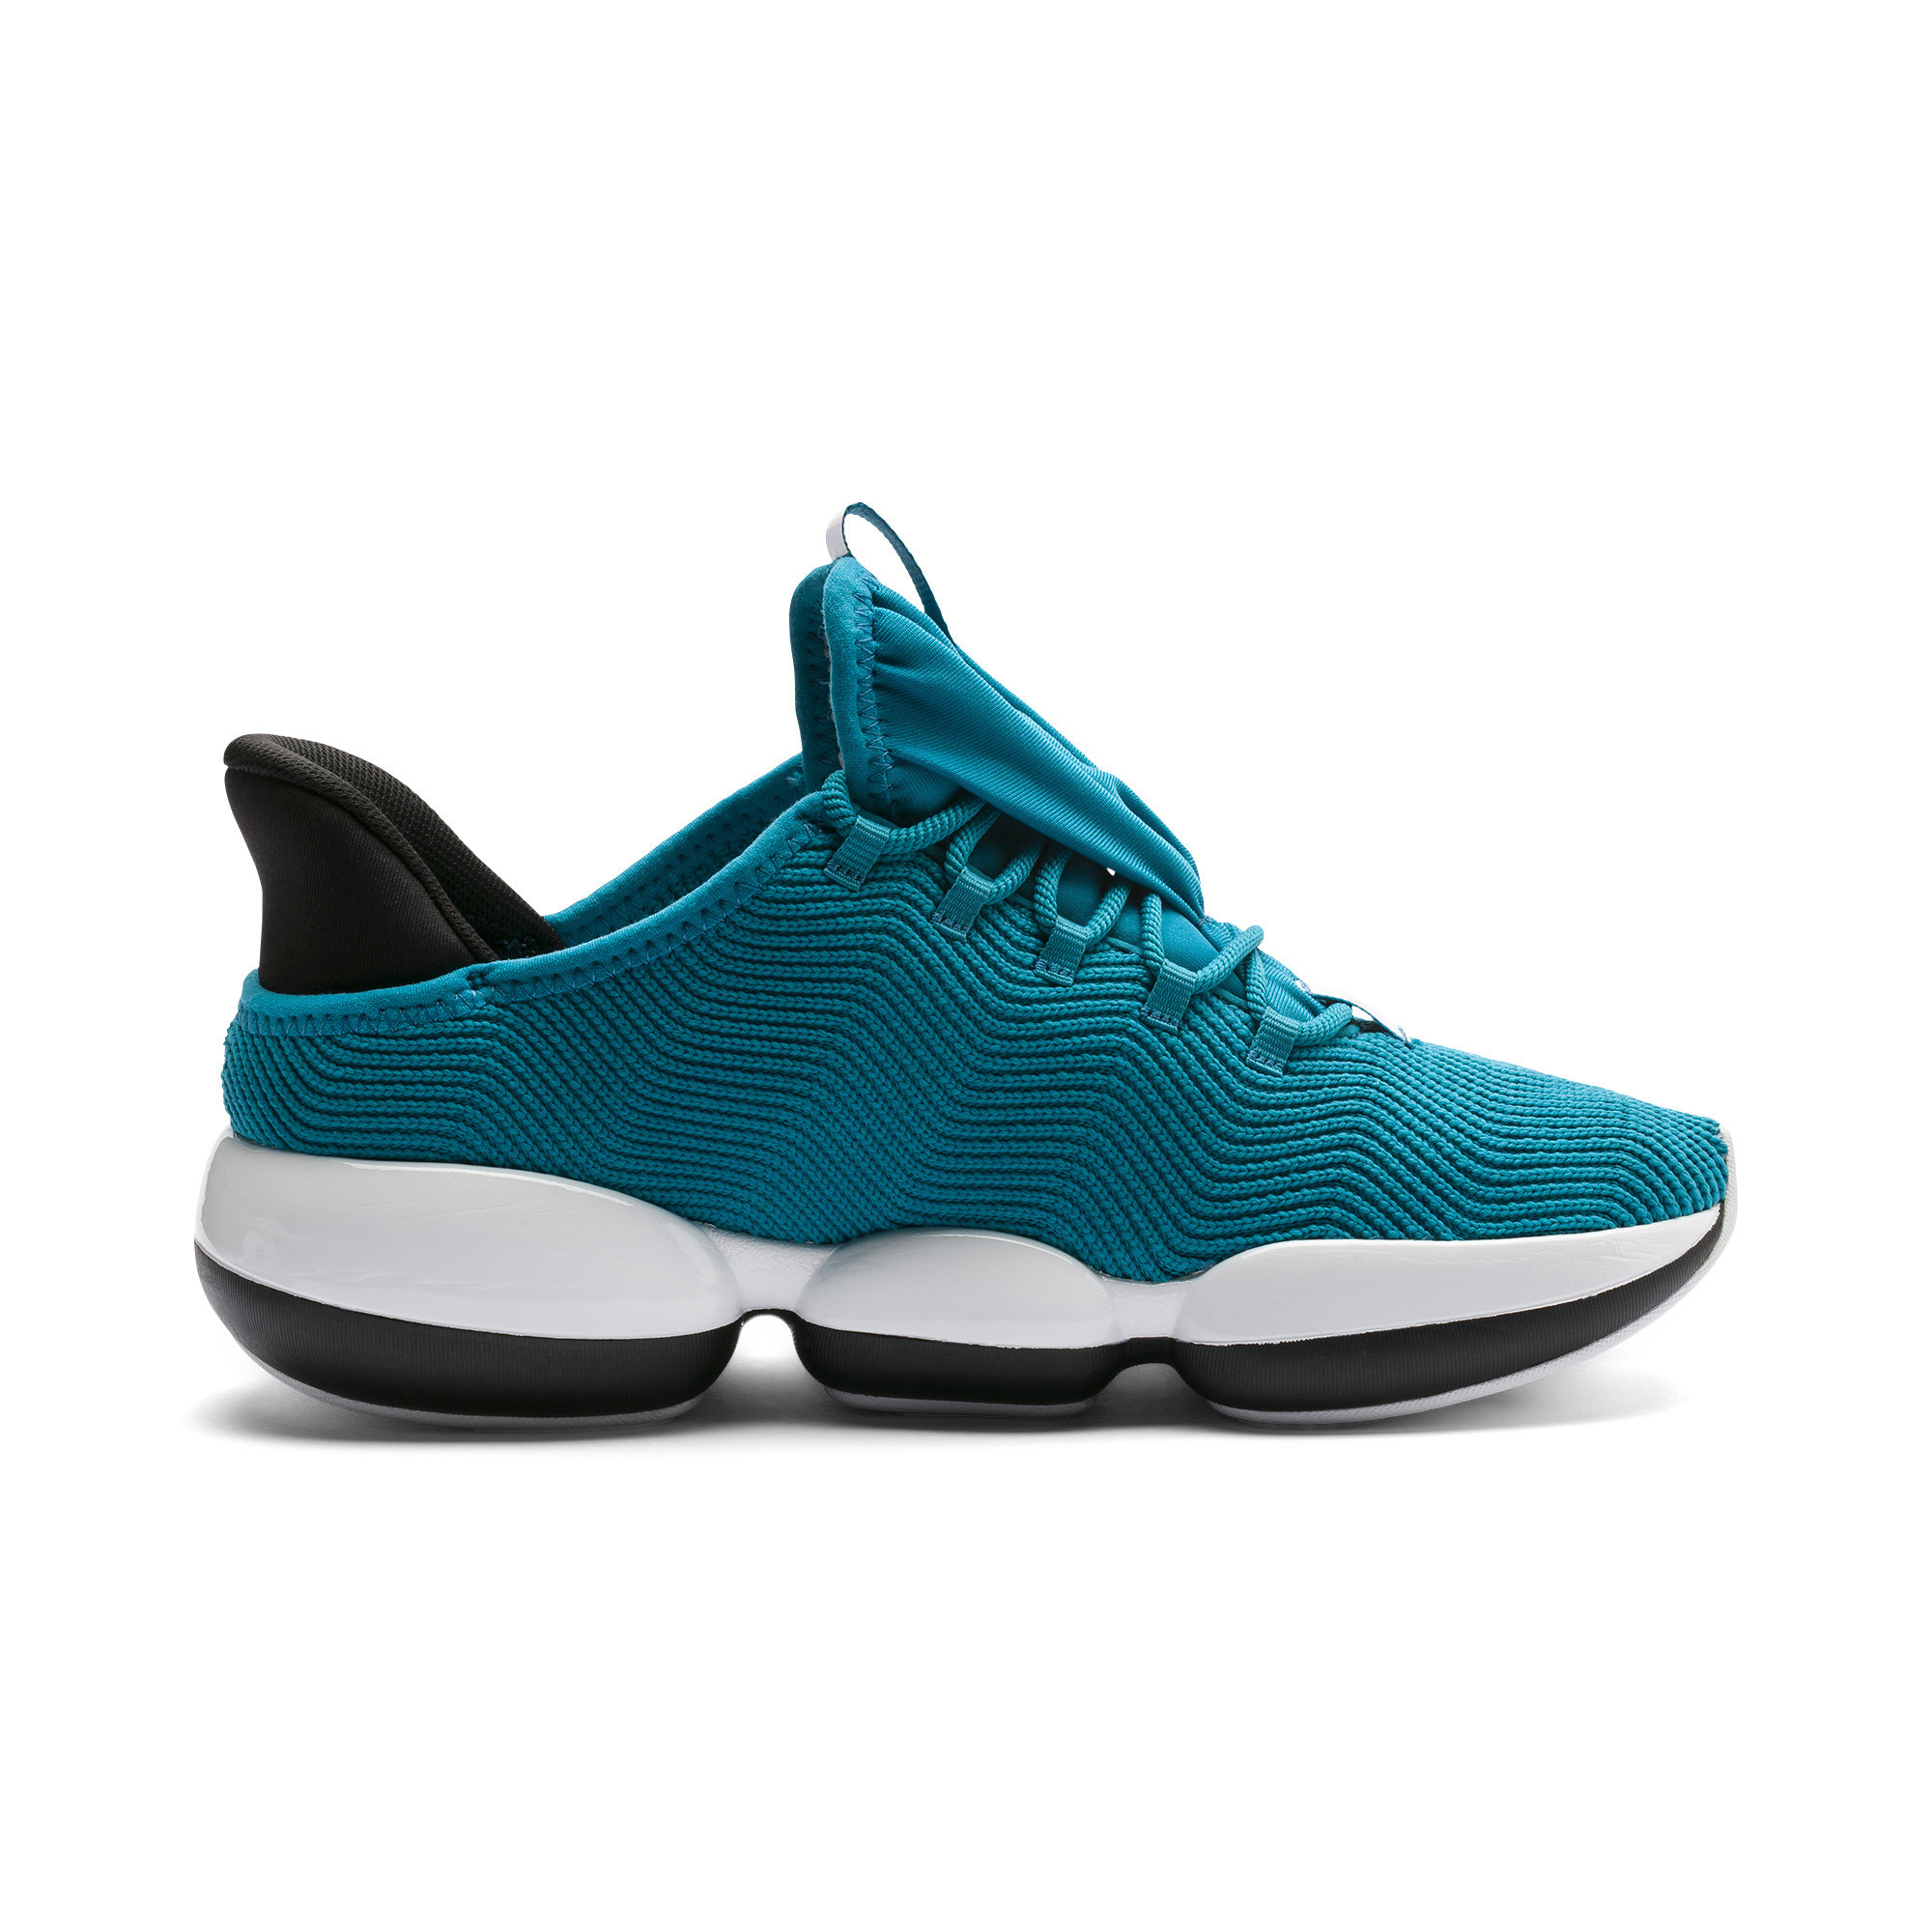 Image Puma Mode XT Iridescent Trailblazer Women's Sneakers #6